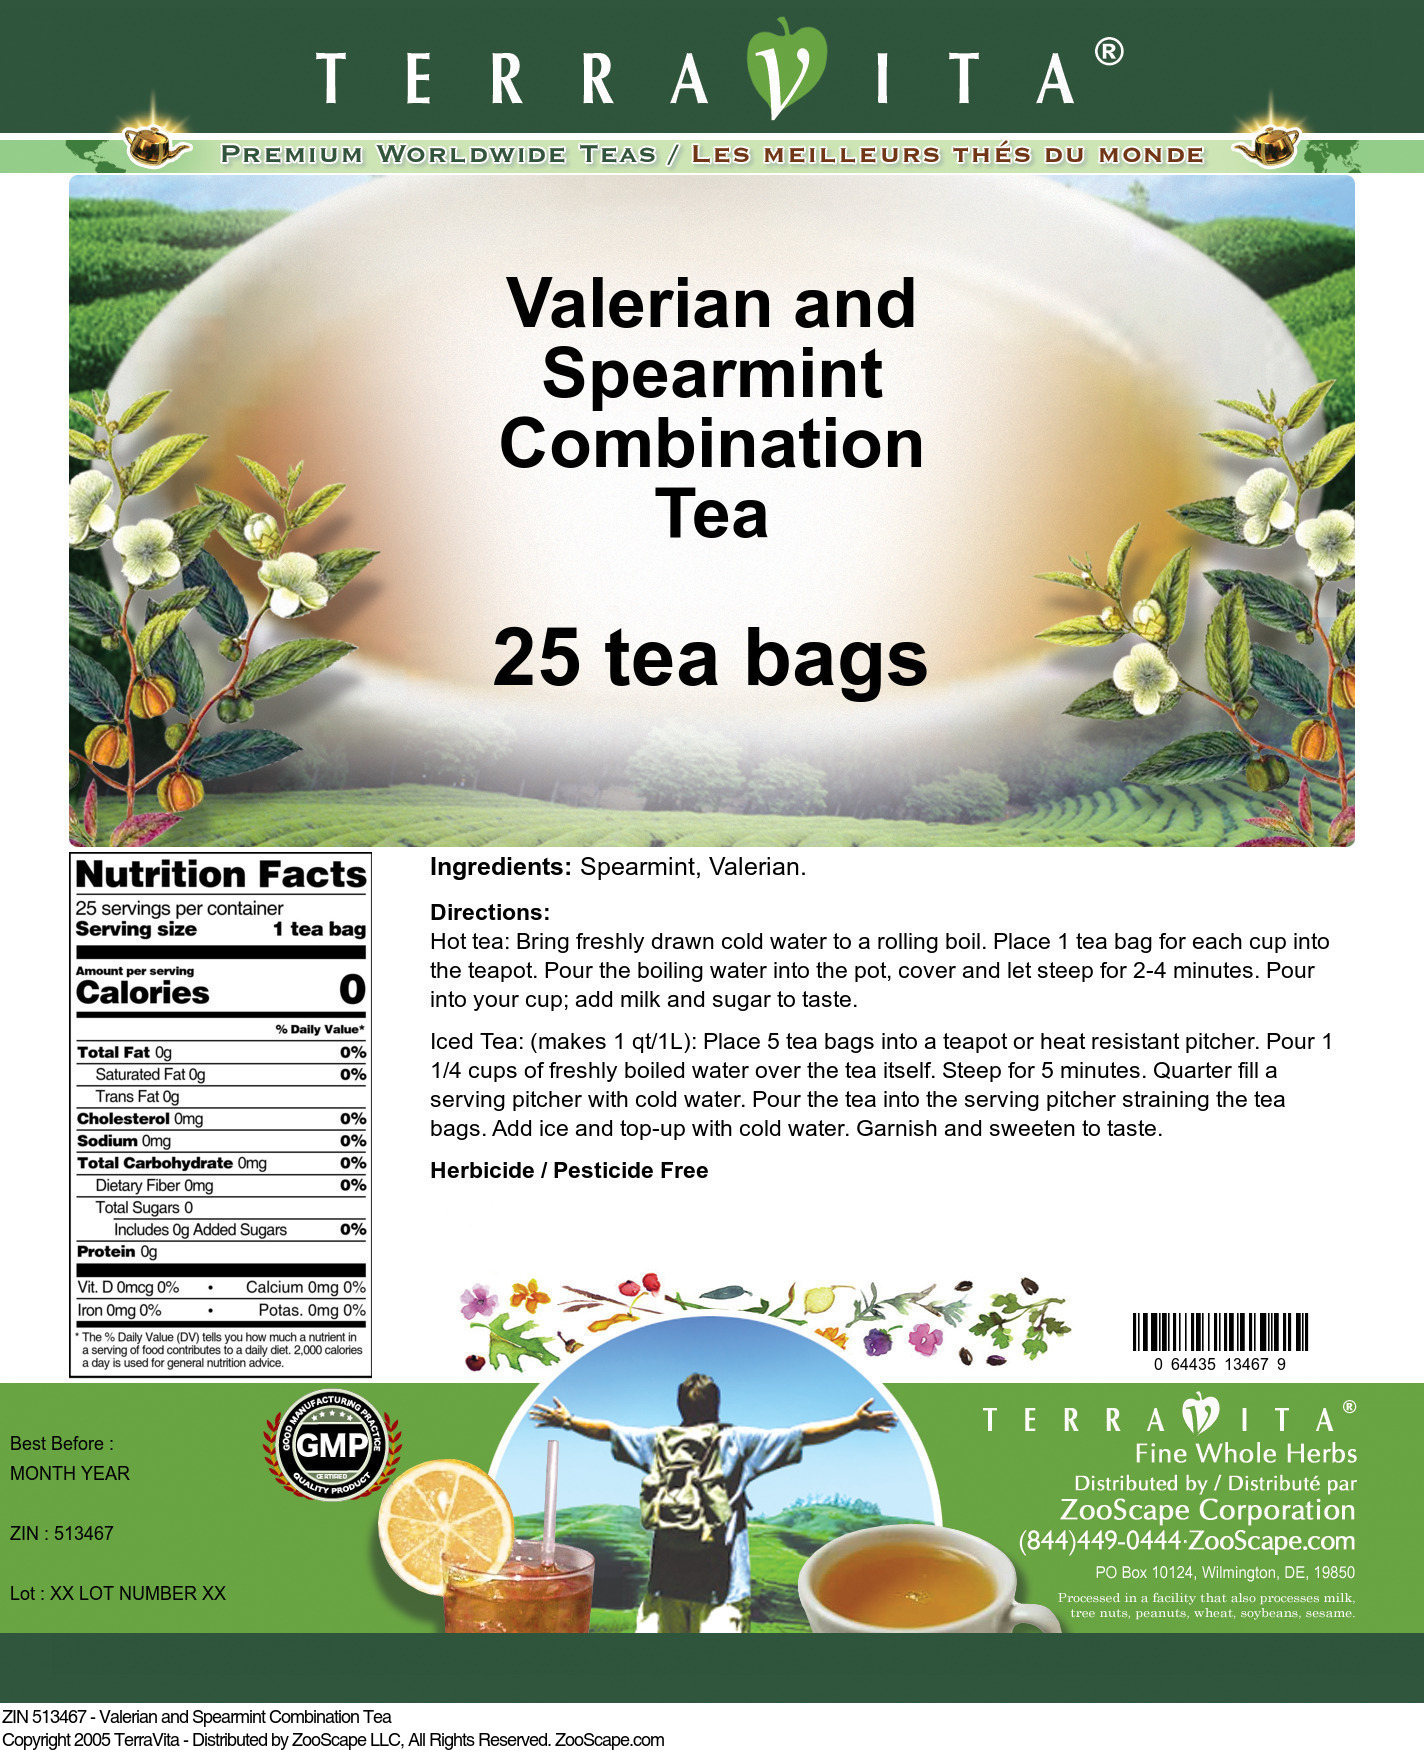 Valerian and Spearmint Combination Tea